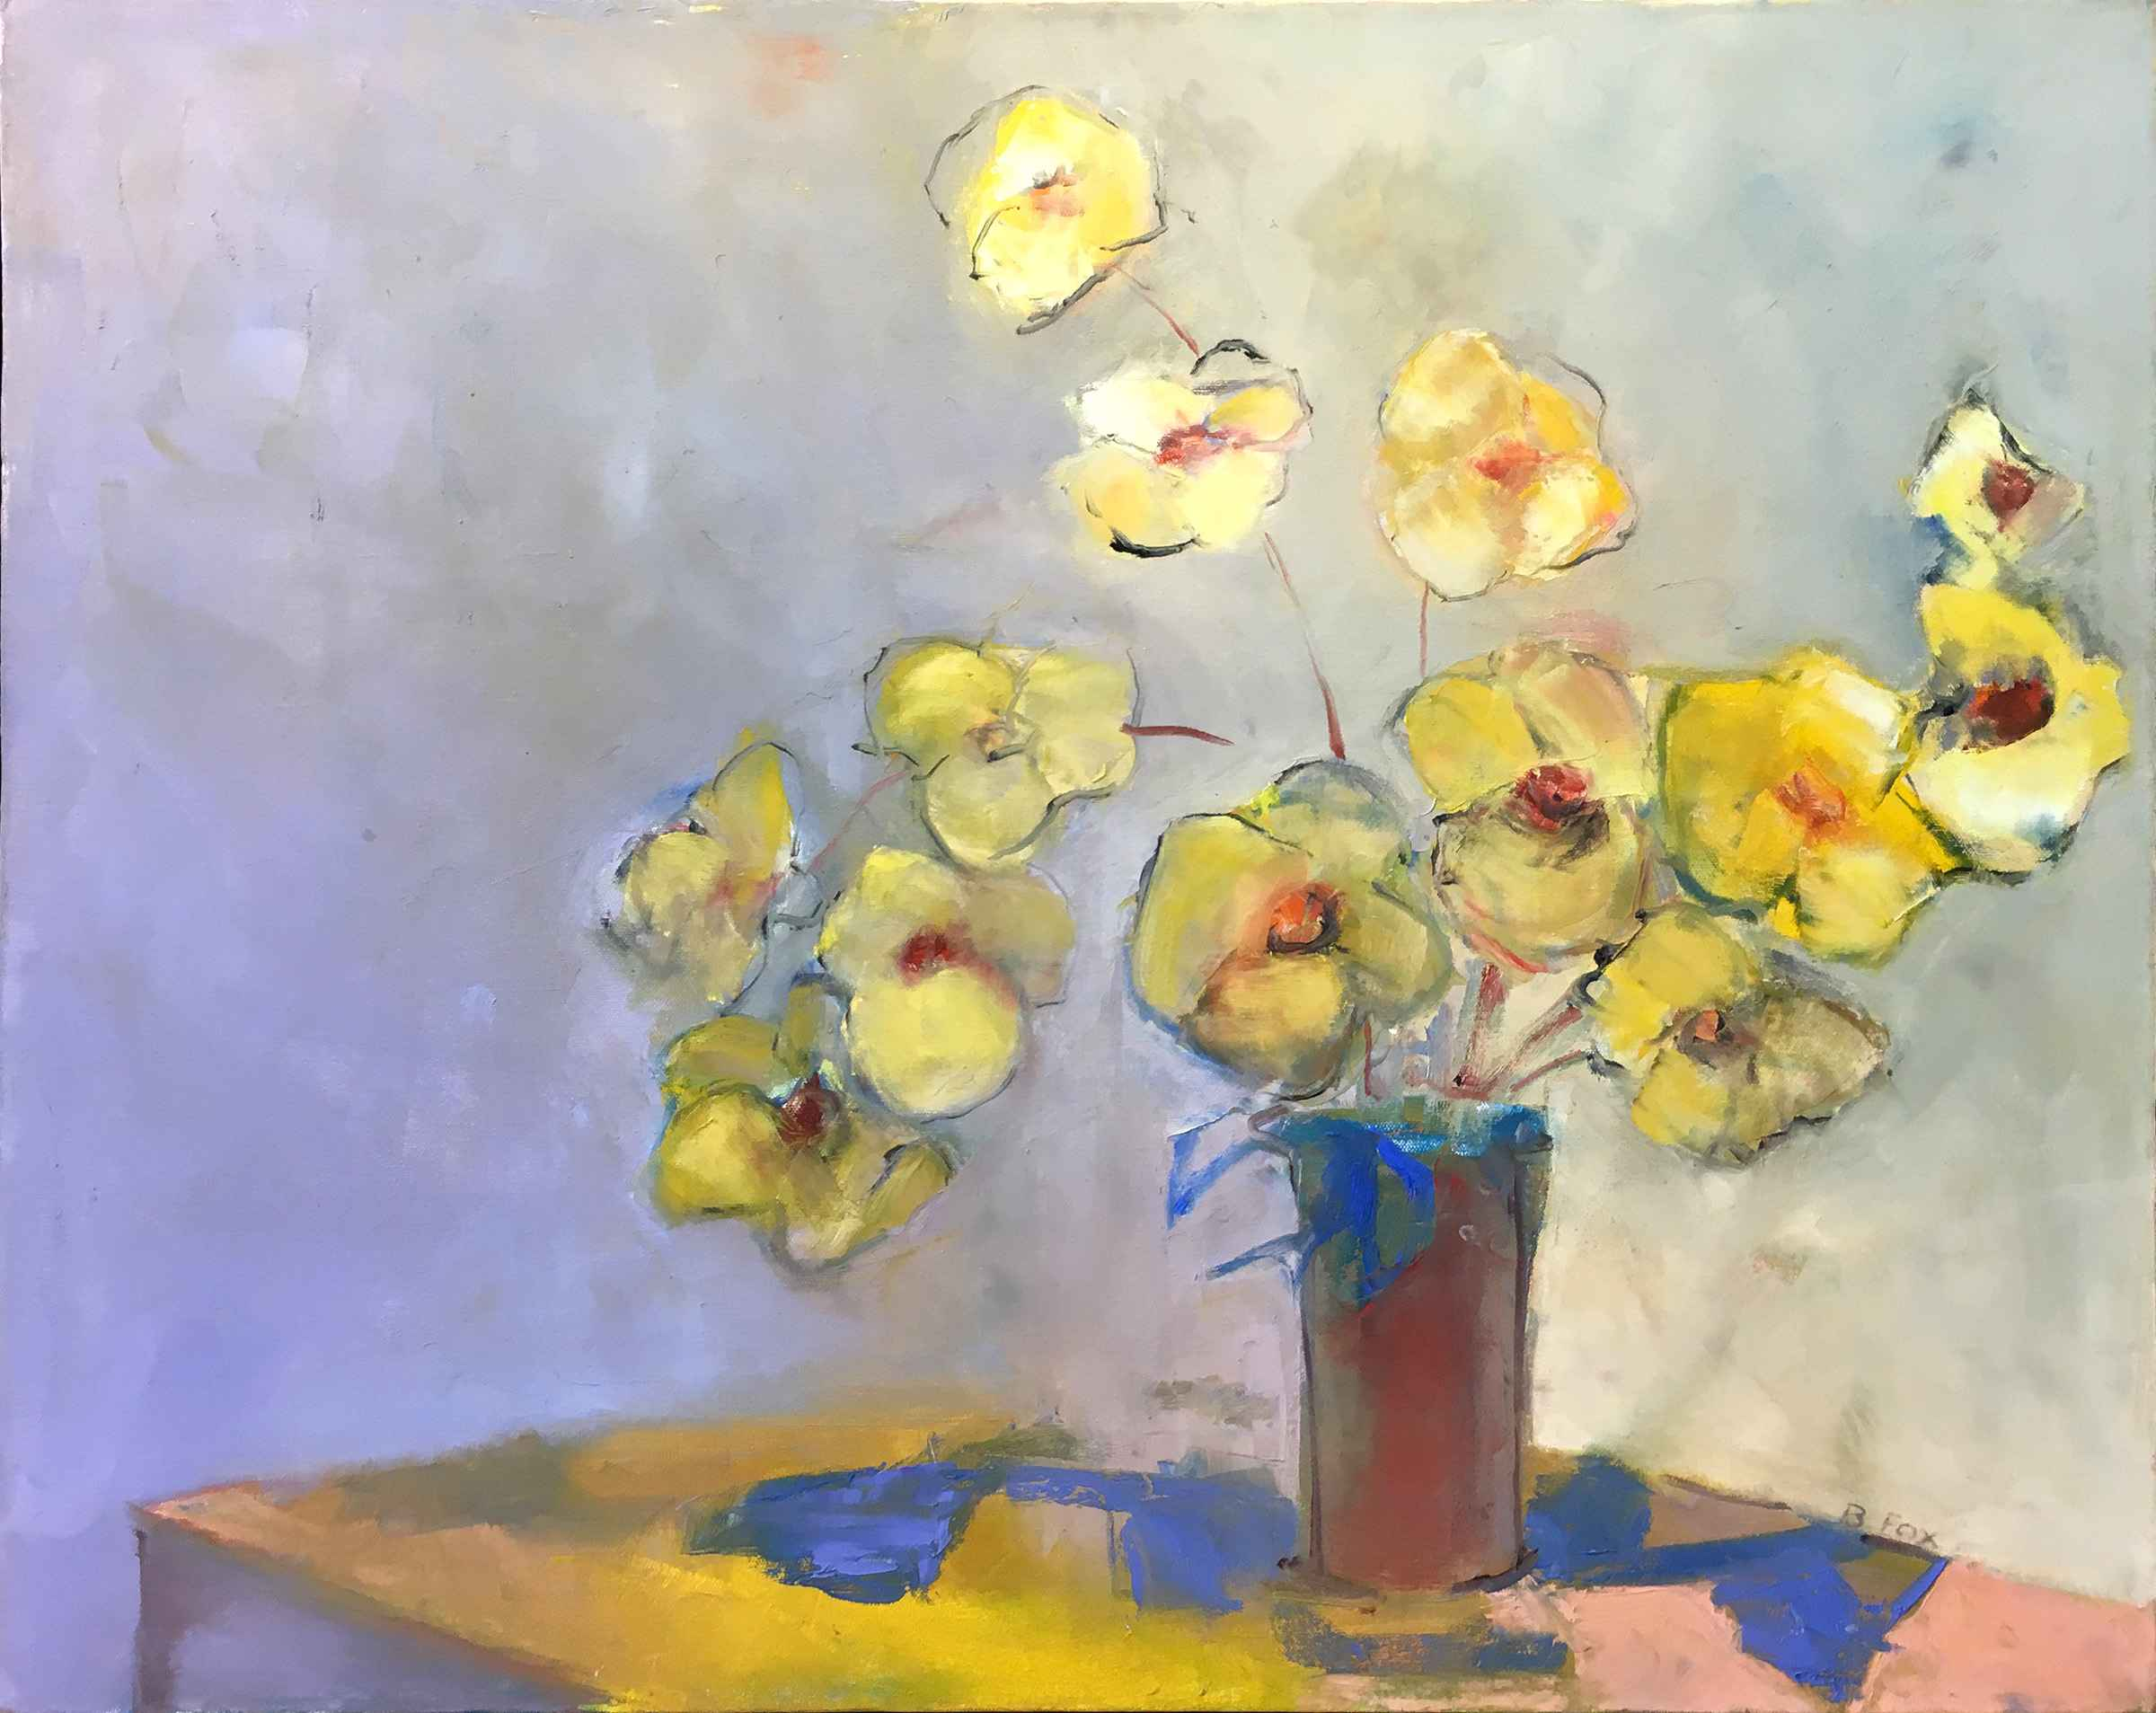 Perpetual Spring by  Brenda Fox - Masterpiece Online